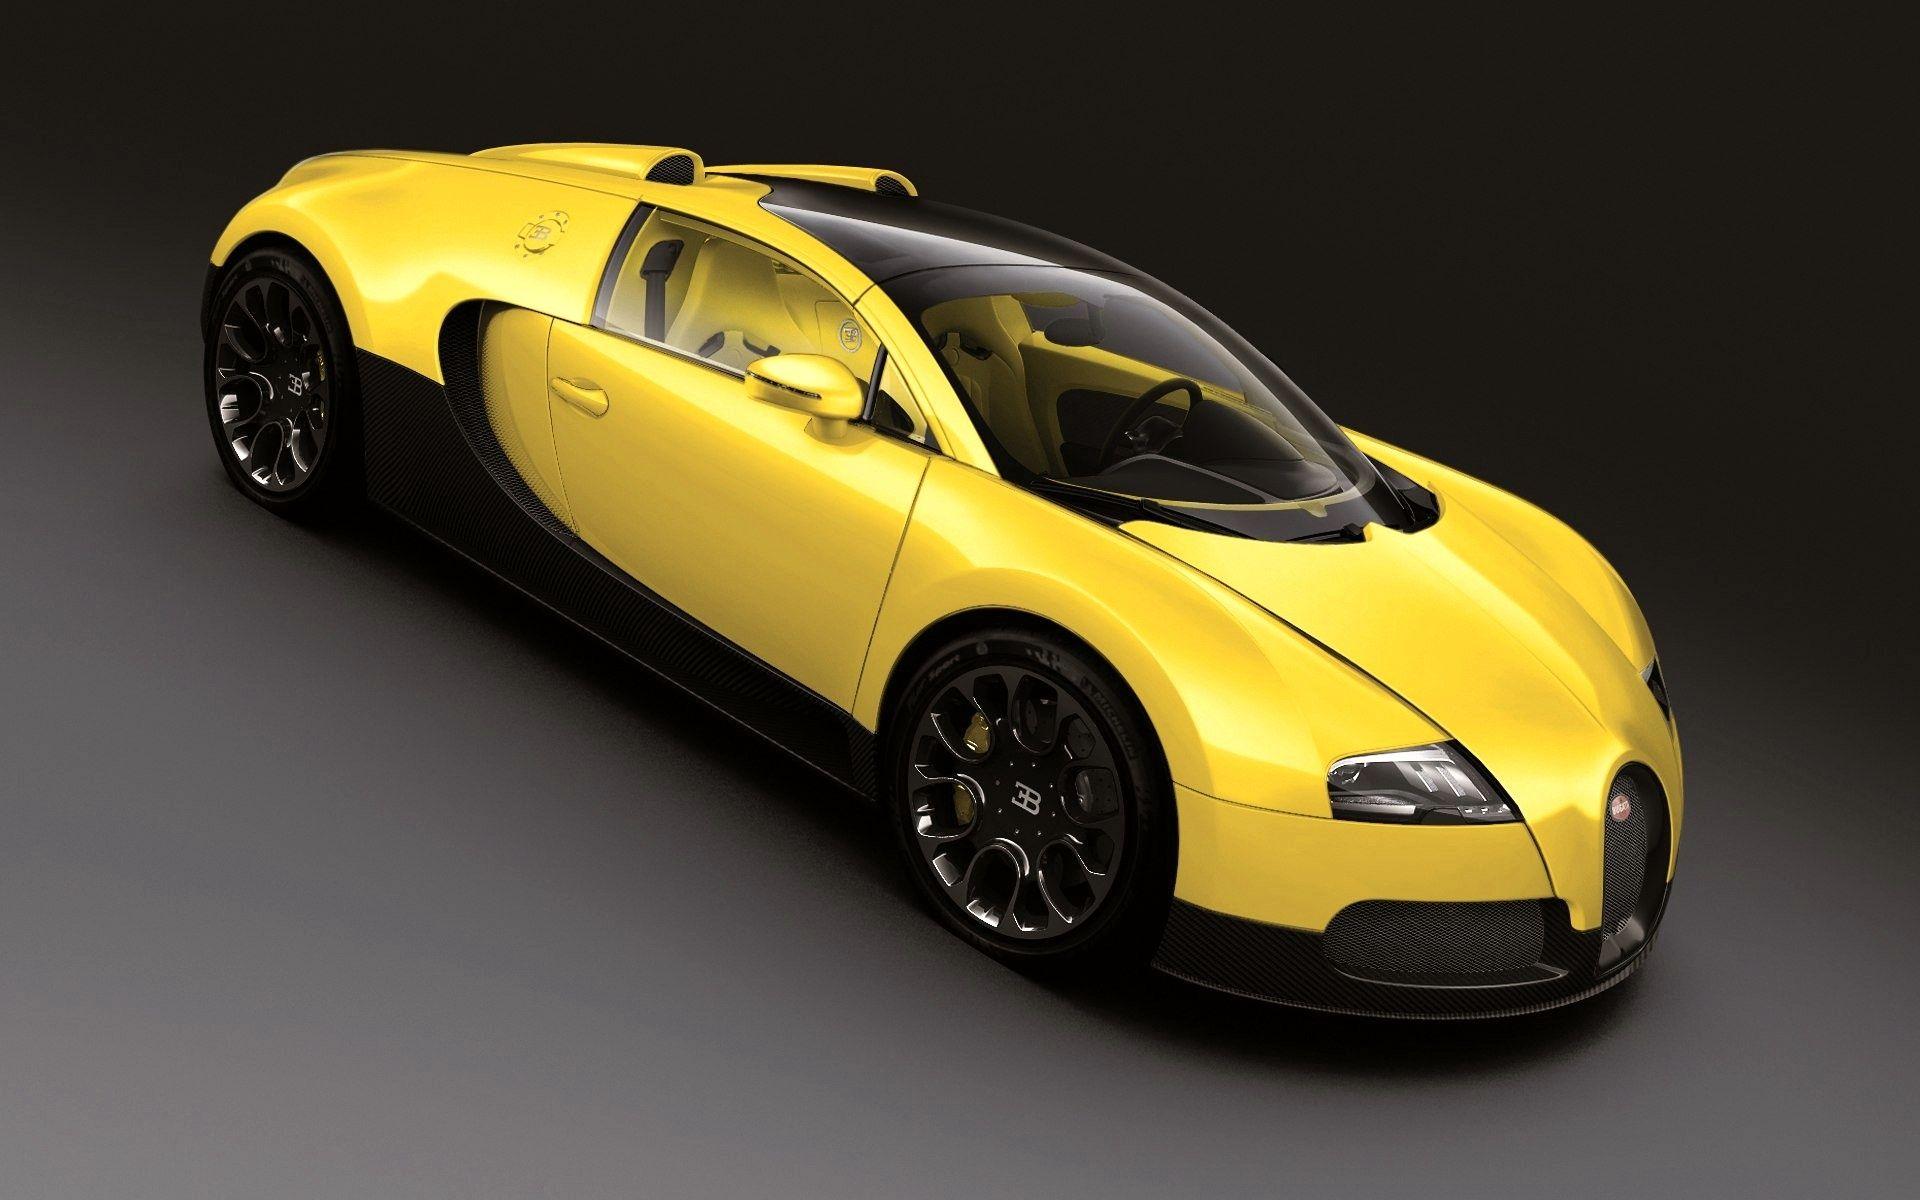 fe7264c3830eb65241e4c916f8ee683d Wonderful Bugatti Veyron Grand Sport Vitesse Mansory Vivere 2014 Cars Trend